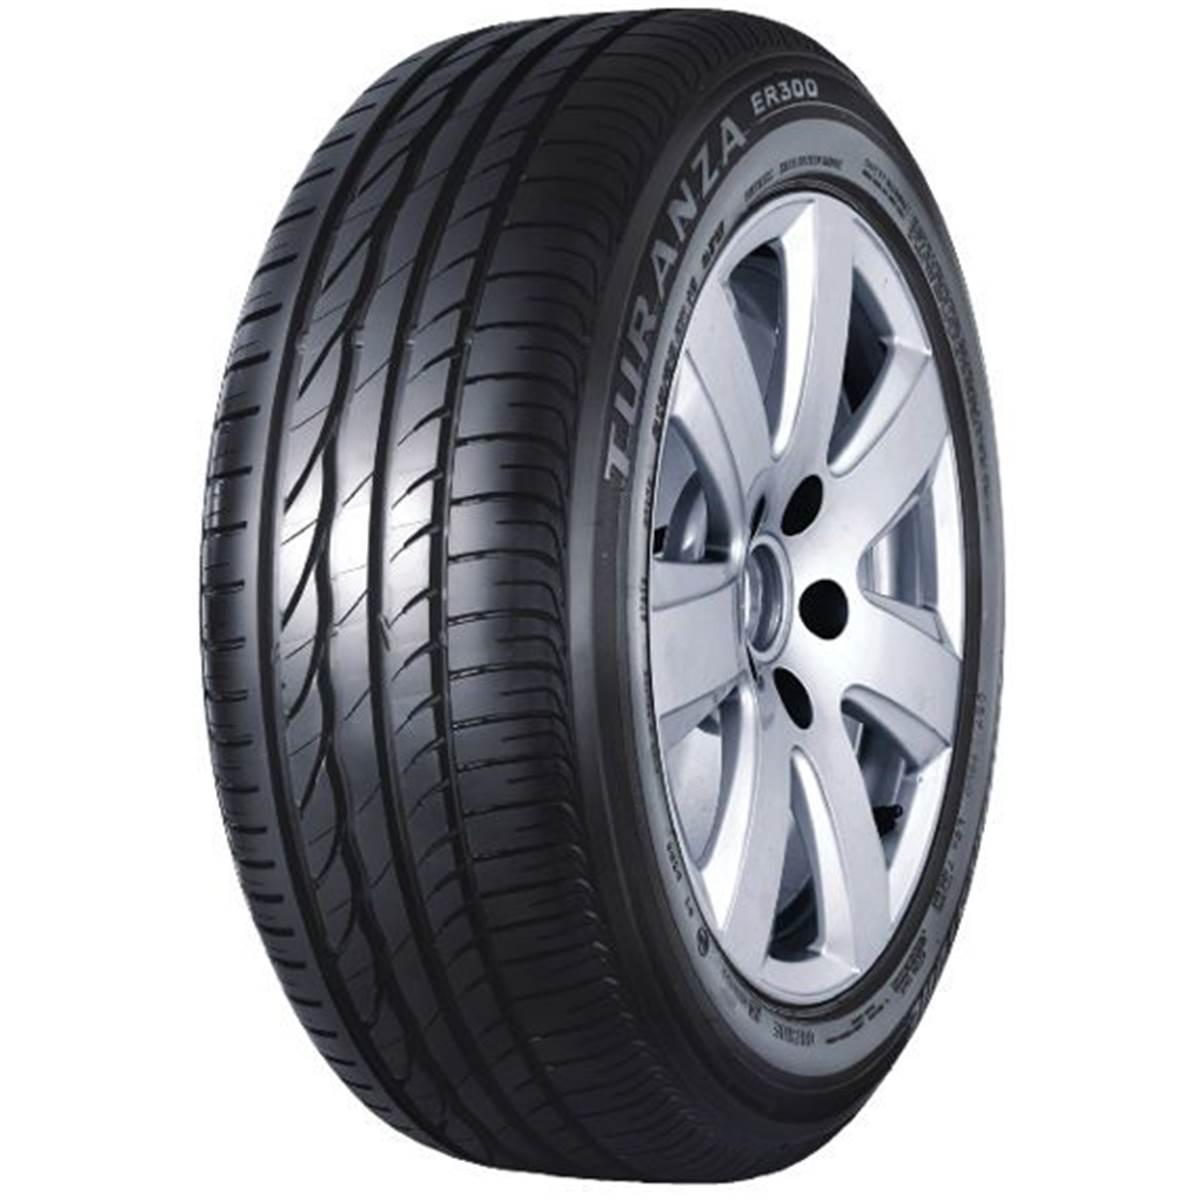 Pneu Bridgestone 205/50R17 93V Turanza Er300 XL